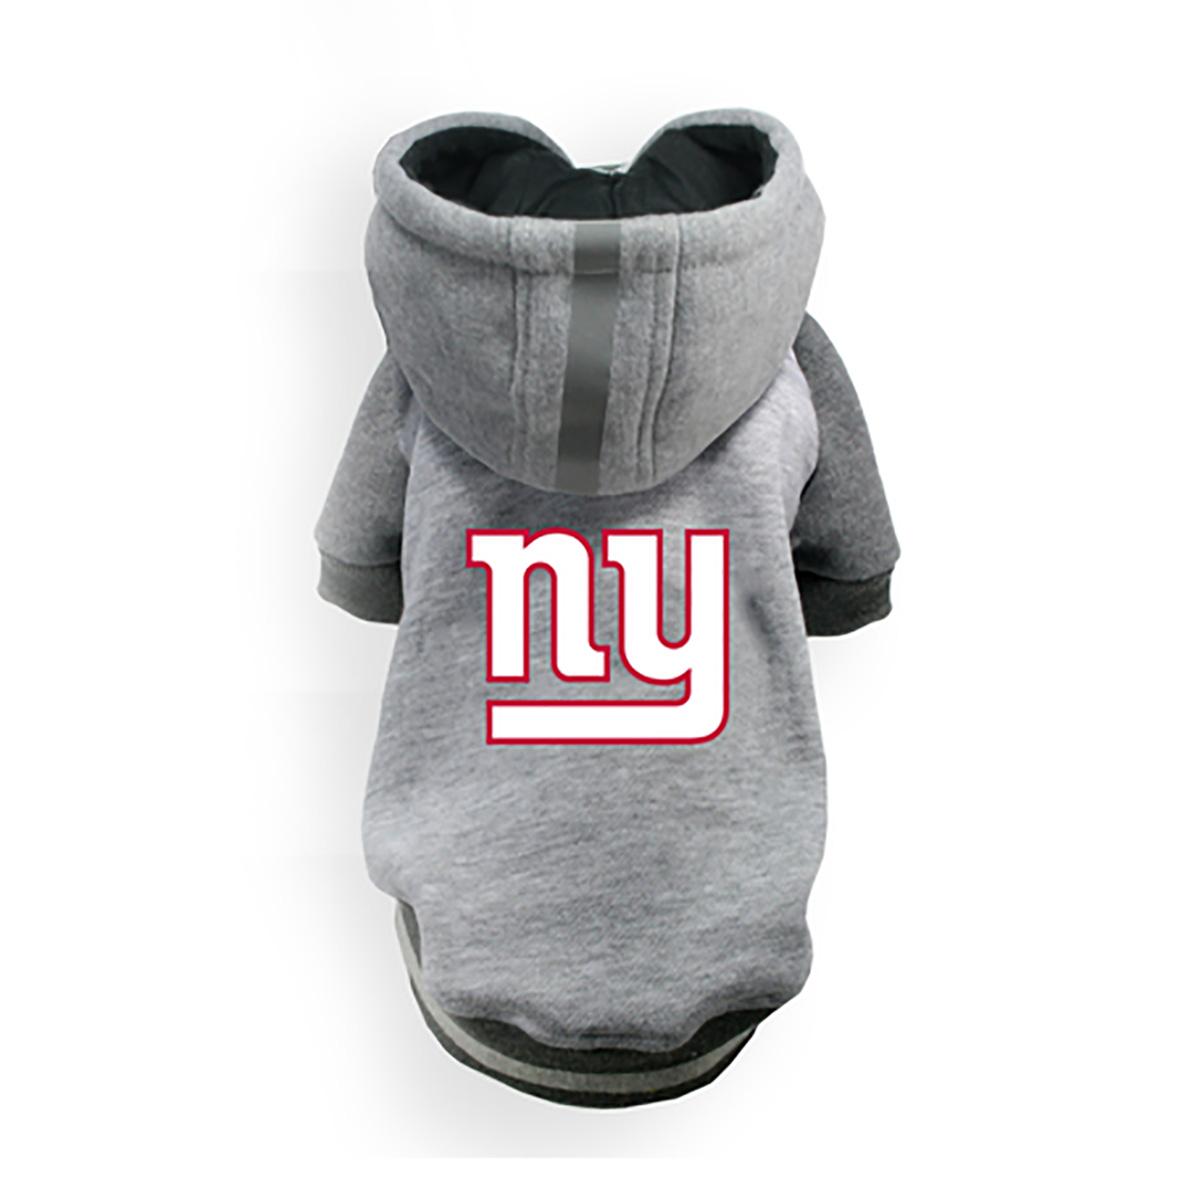 New York Giants NFL Dog Hoodie - Gray